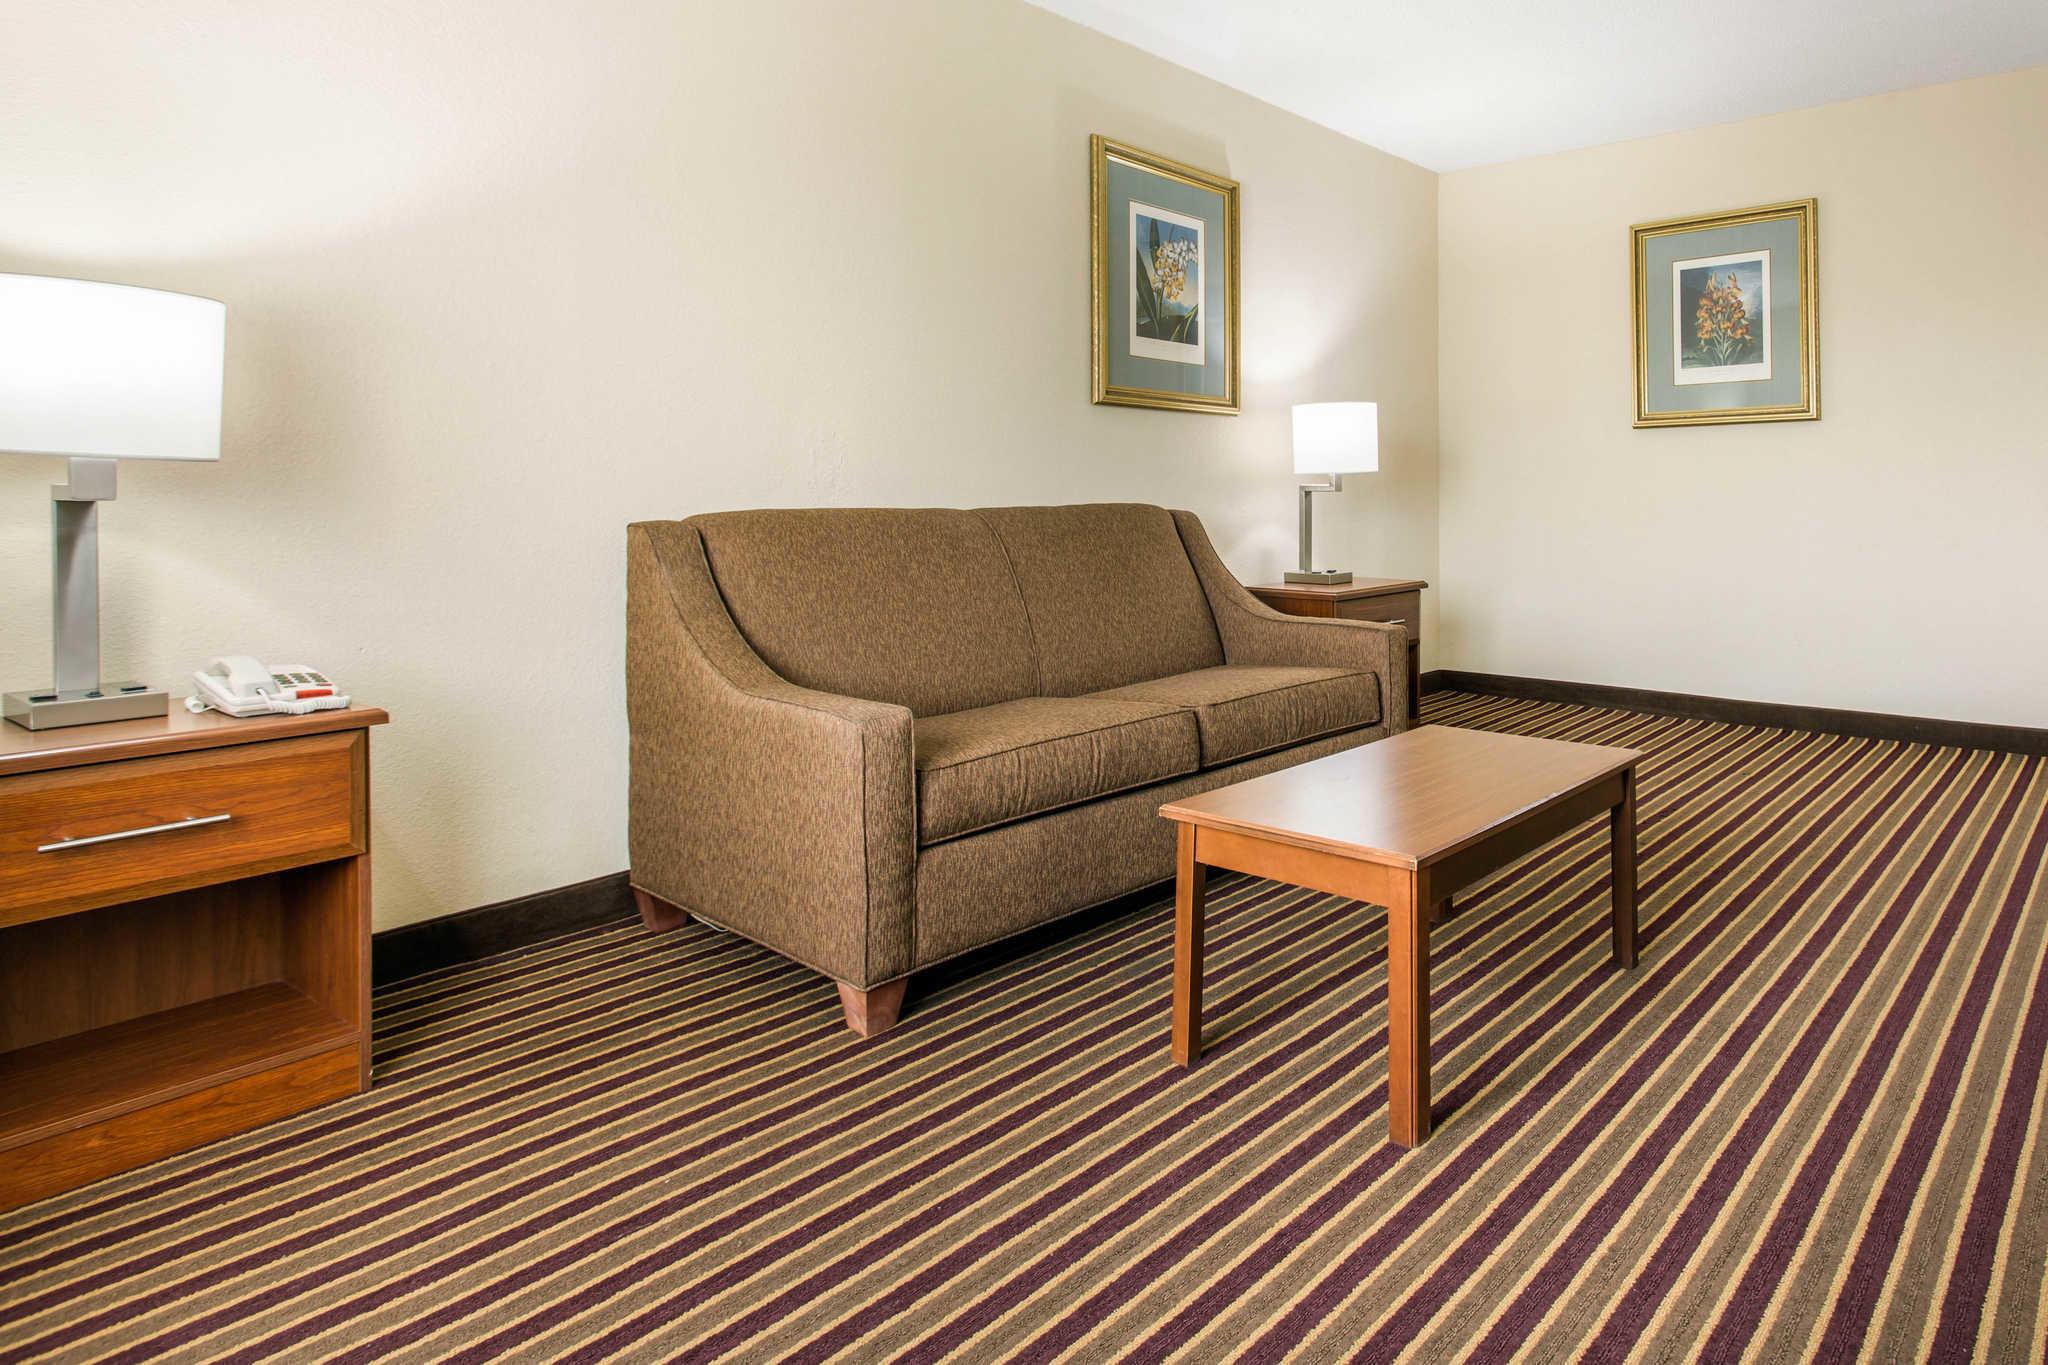 Comfort Inn & Suites Crabtree Valley image 26